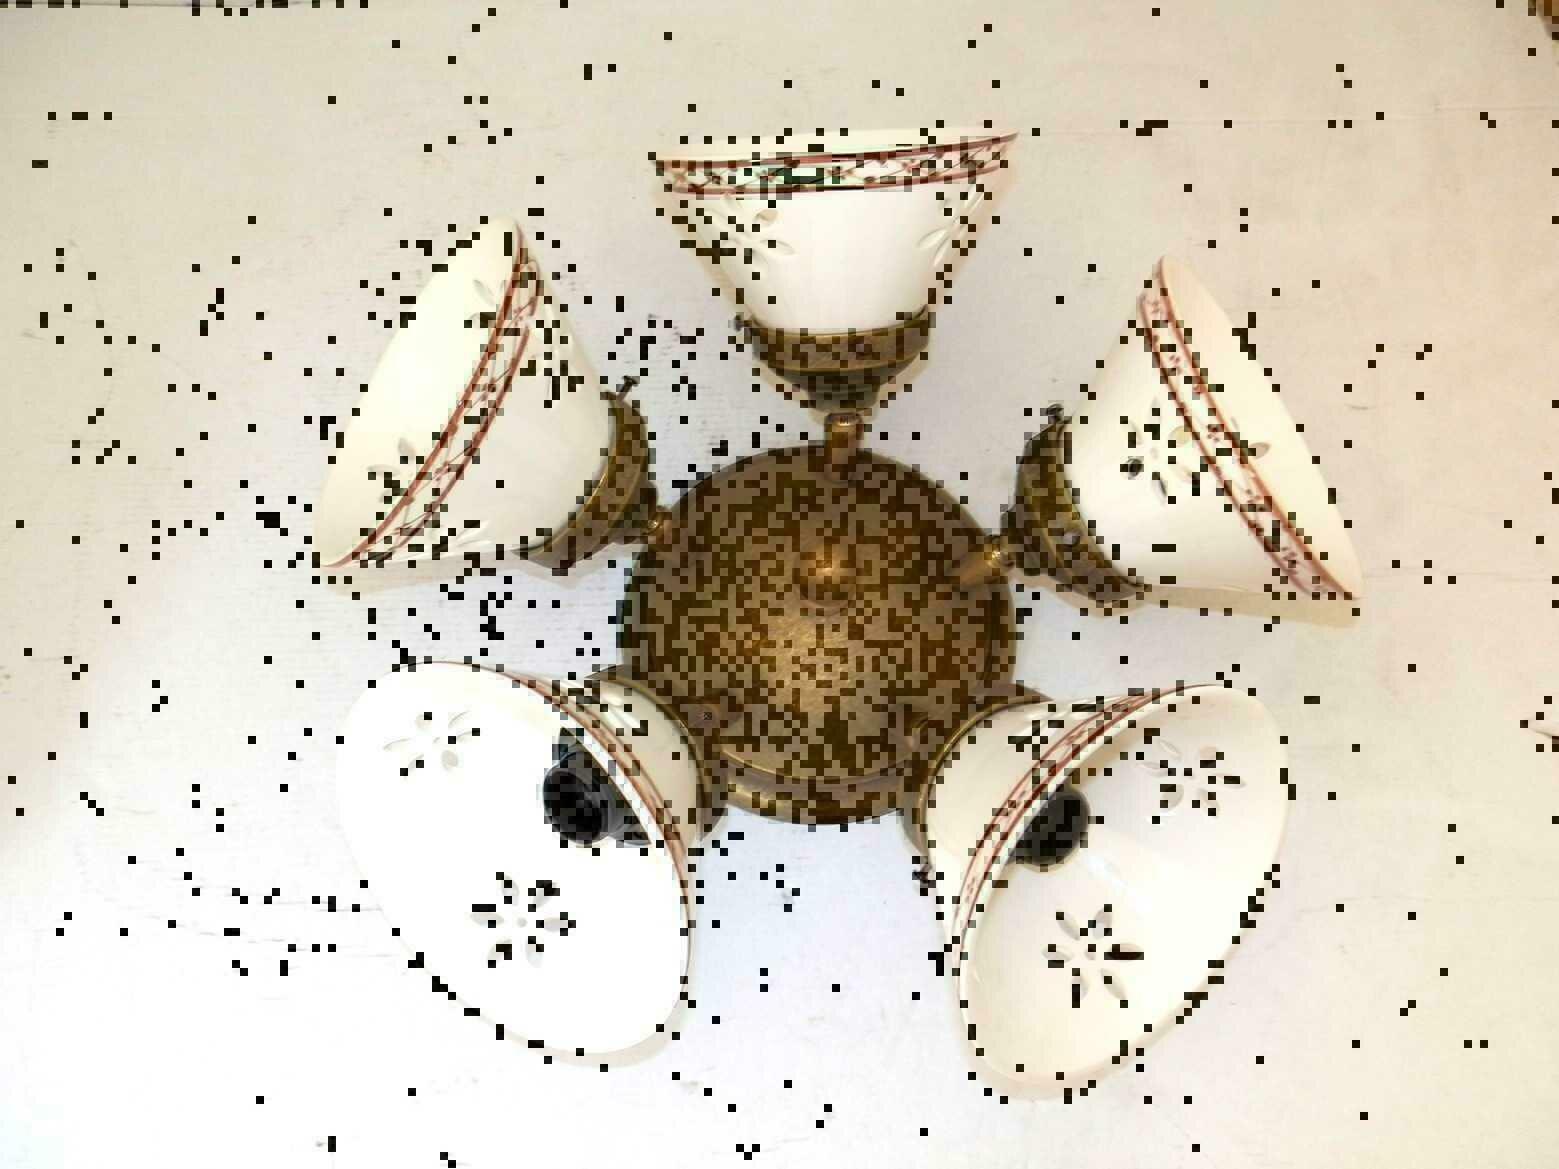 Sostituire Plafoniera Con Lampadario : Applique lampada plafoniera ottone casa arredo luci con ceramica